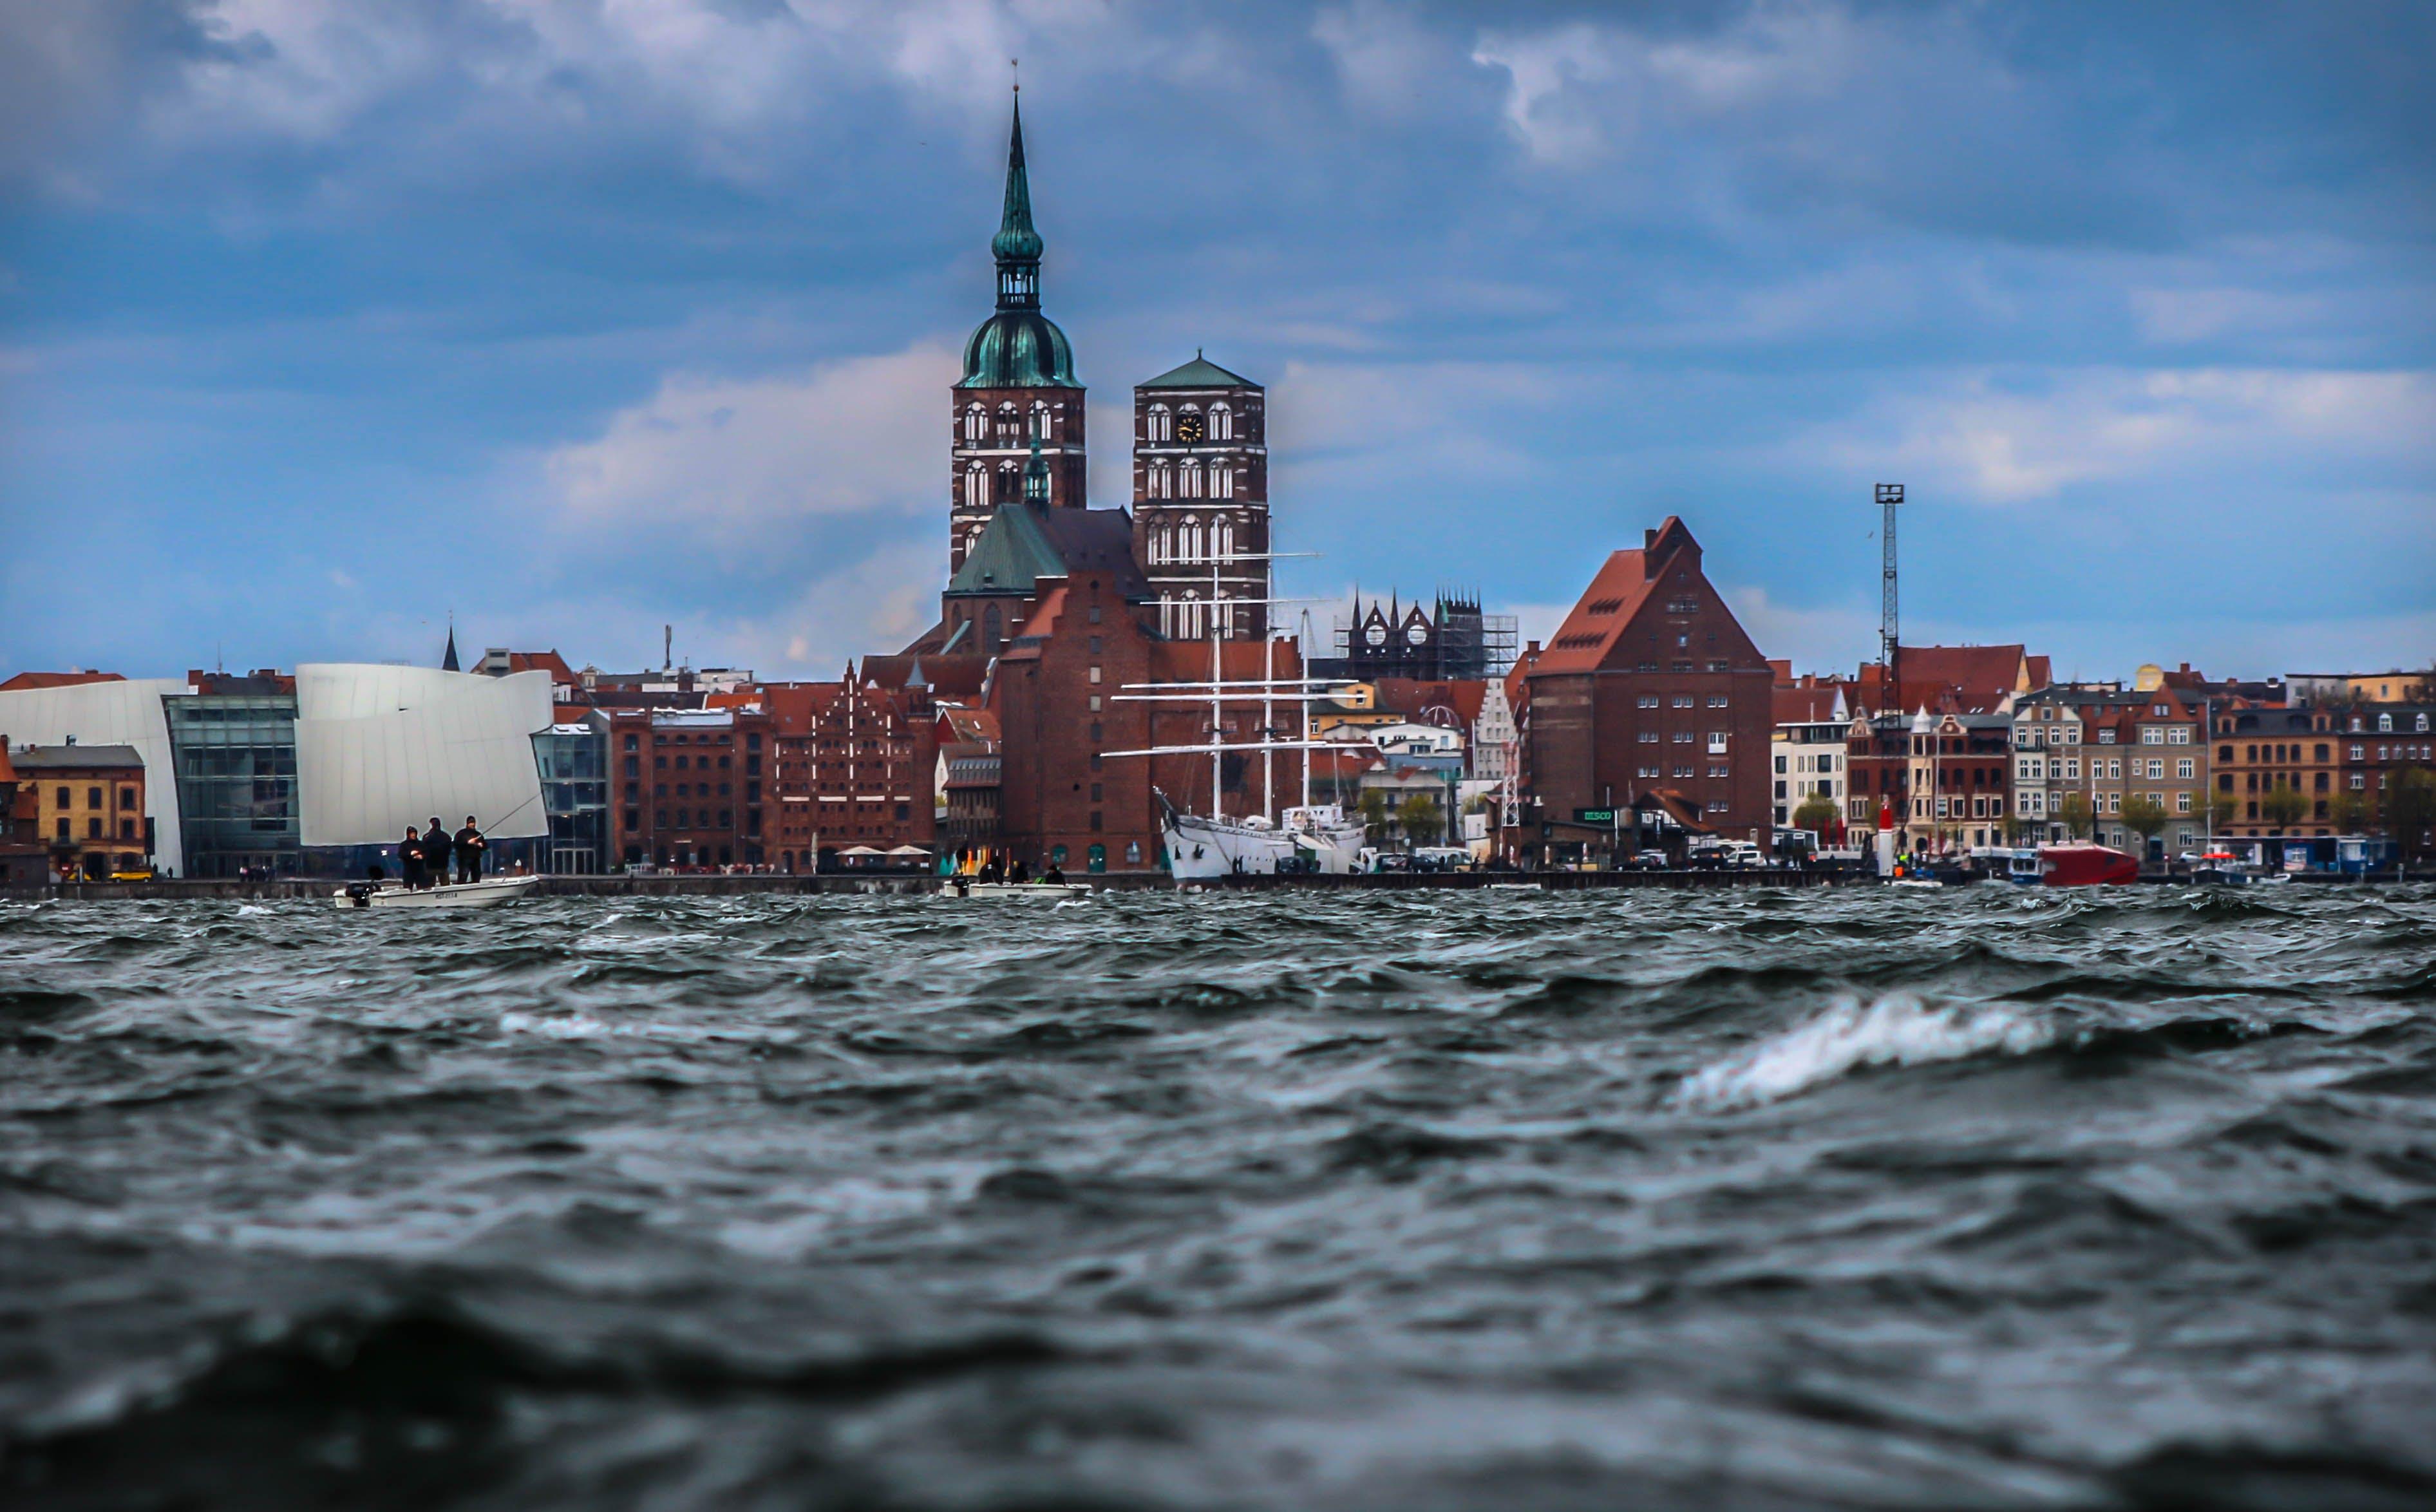 agua, arquitectura, barcos